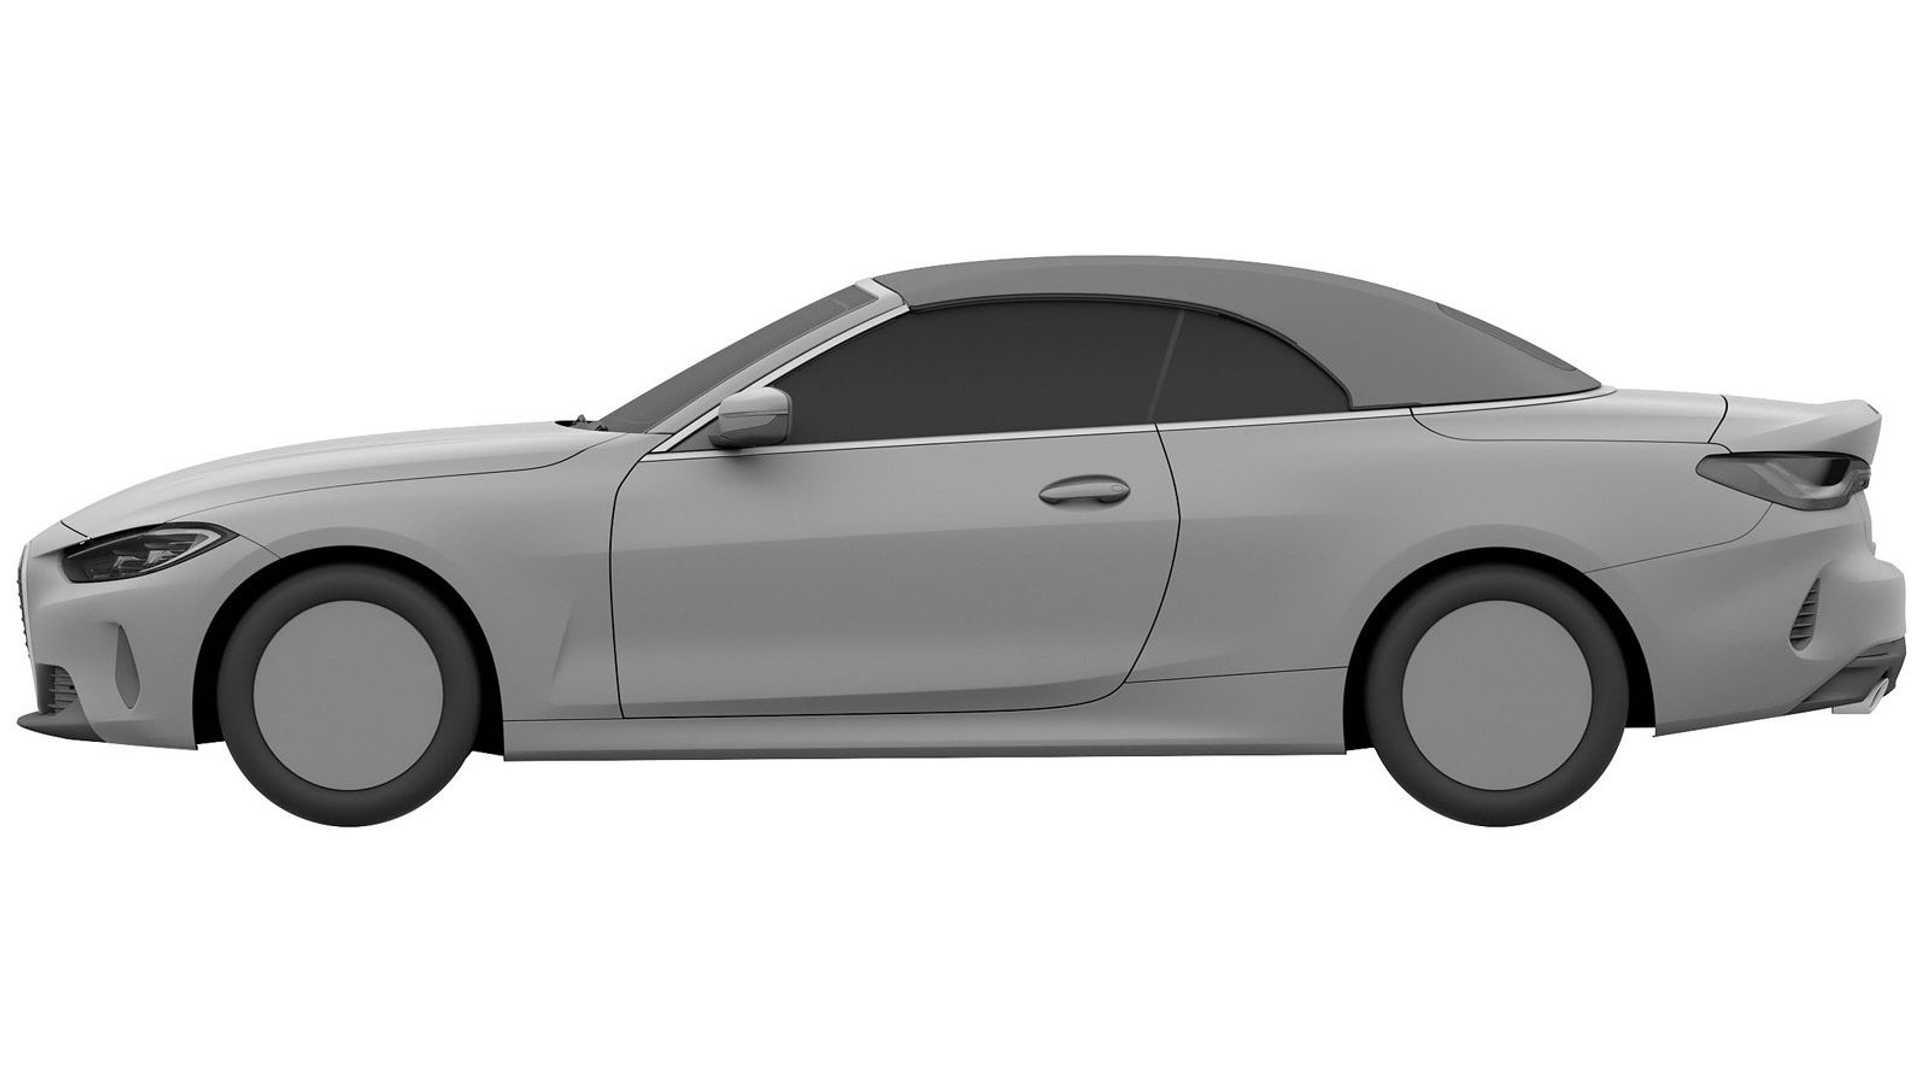 2022-bmw-4-series-convertible-patent (1)